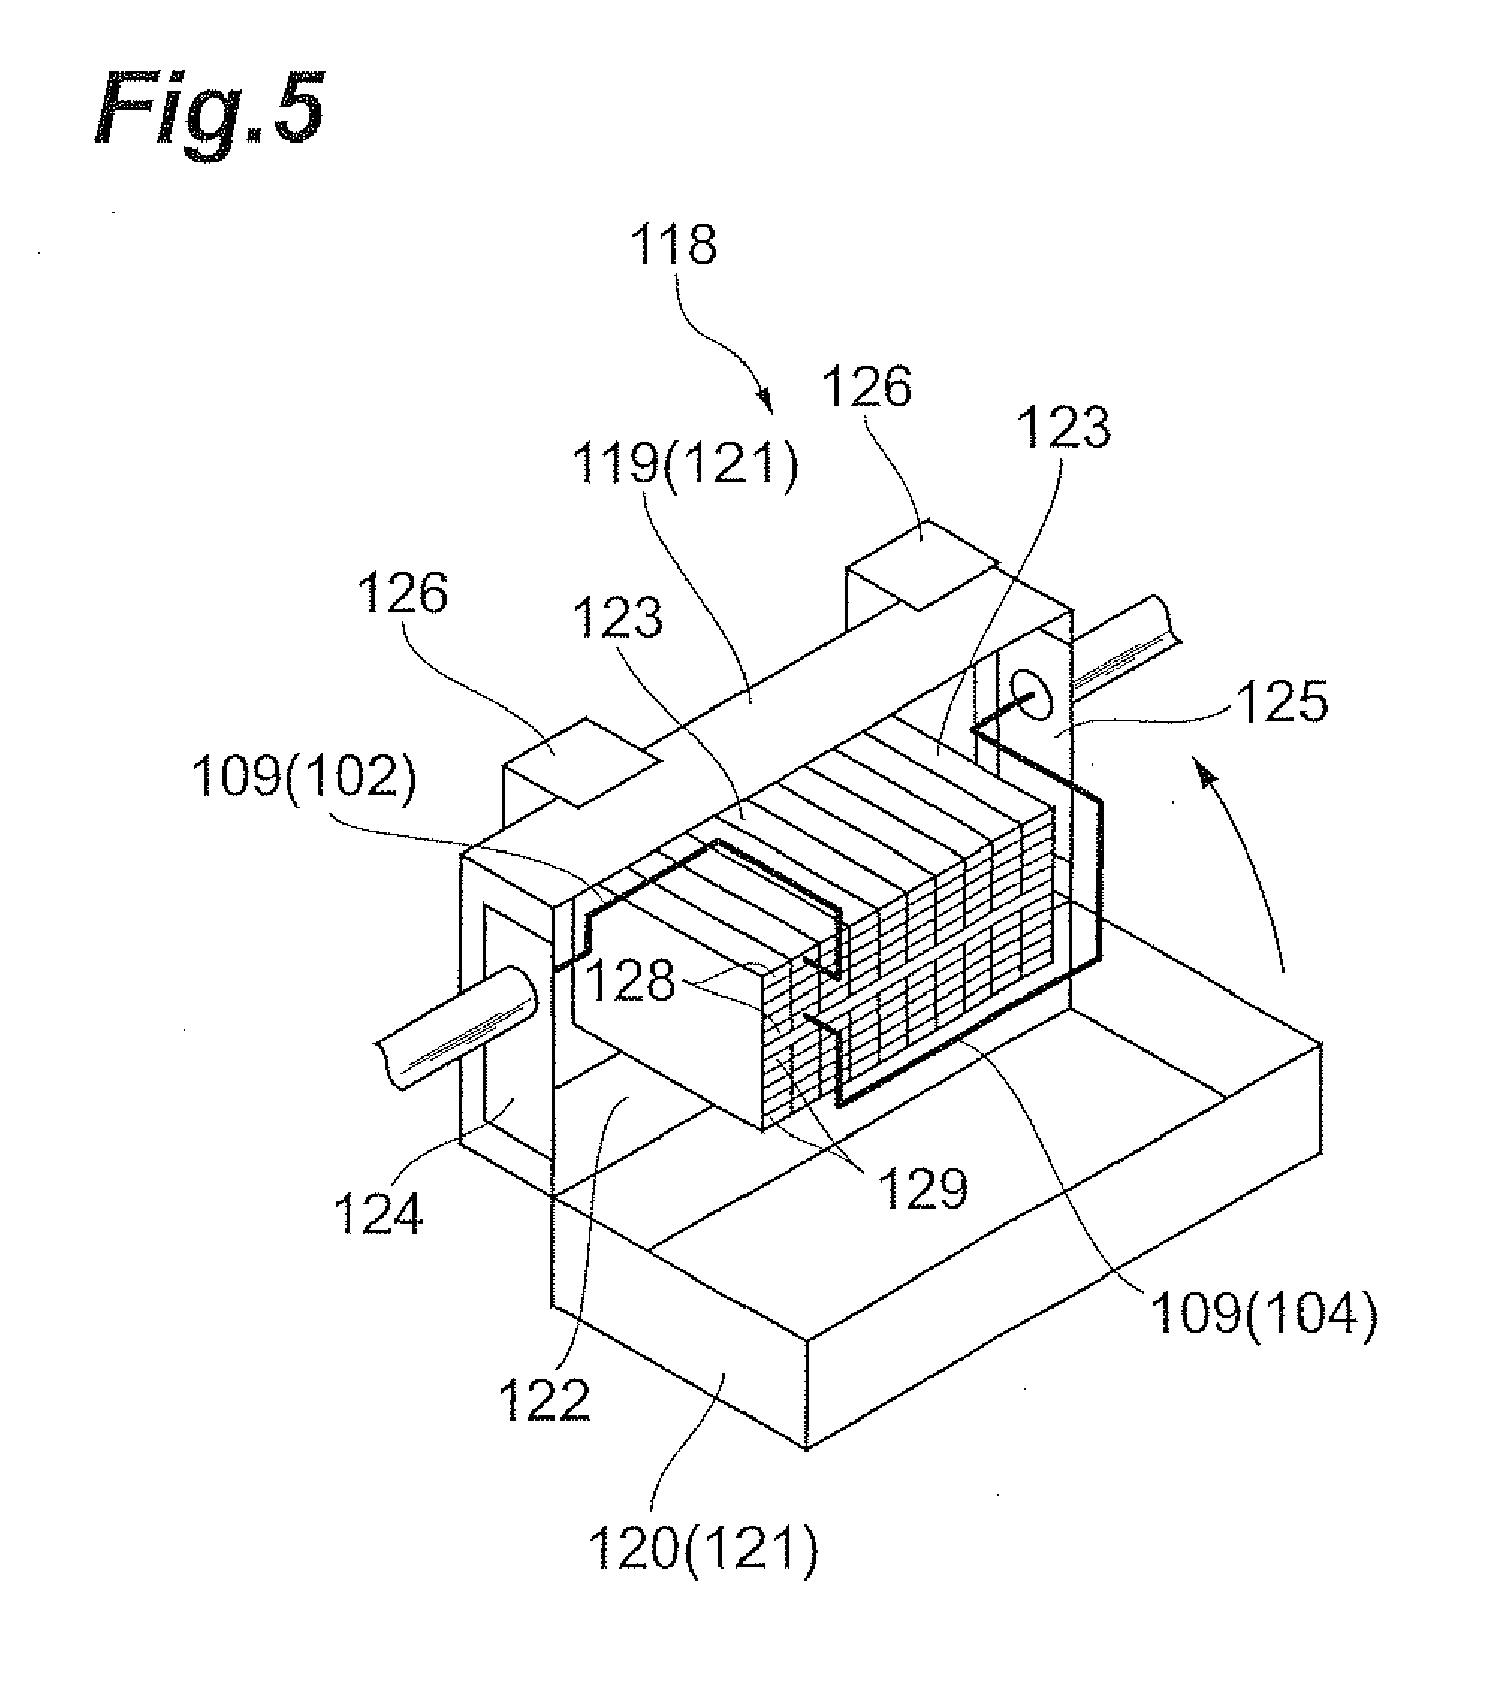 Carlingswitch wiring diagram wiring diagram and engine diagram imgf0005 carlingswitch wiring diagram